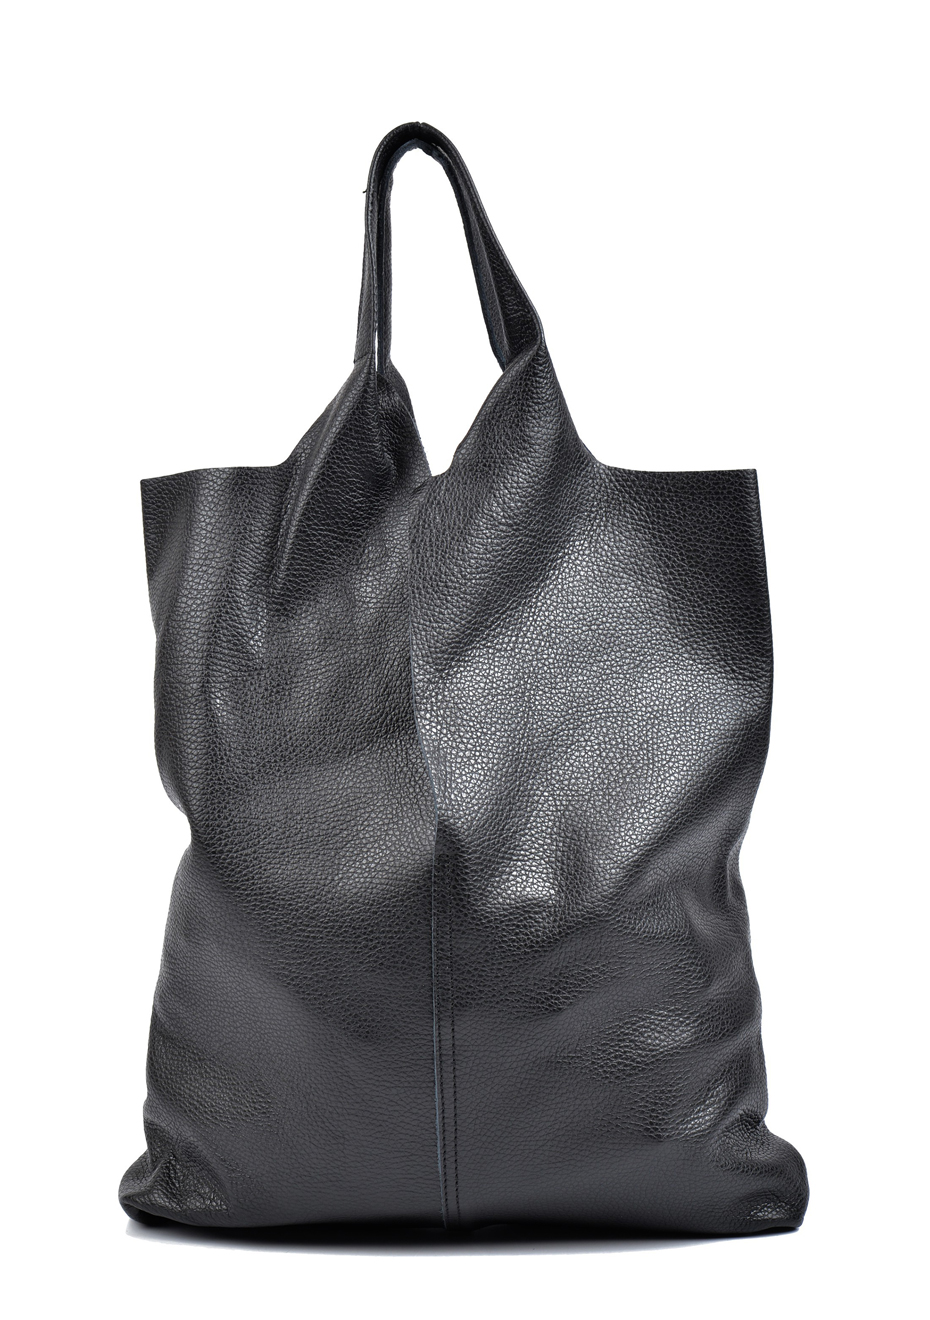 Rhea Bag Genuine Nero Bags Isabella Shopper Leather From Nm8n0w